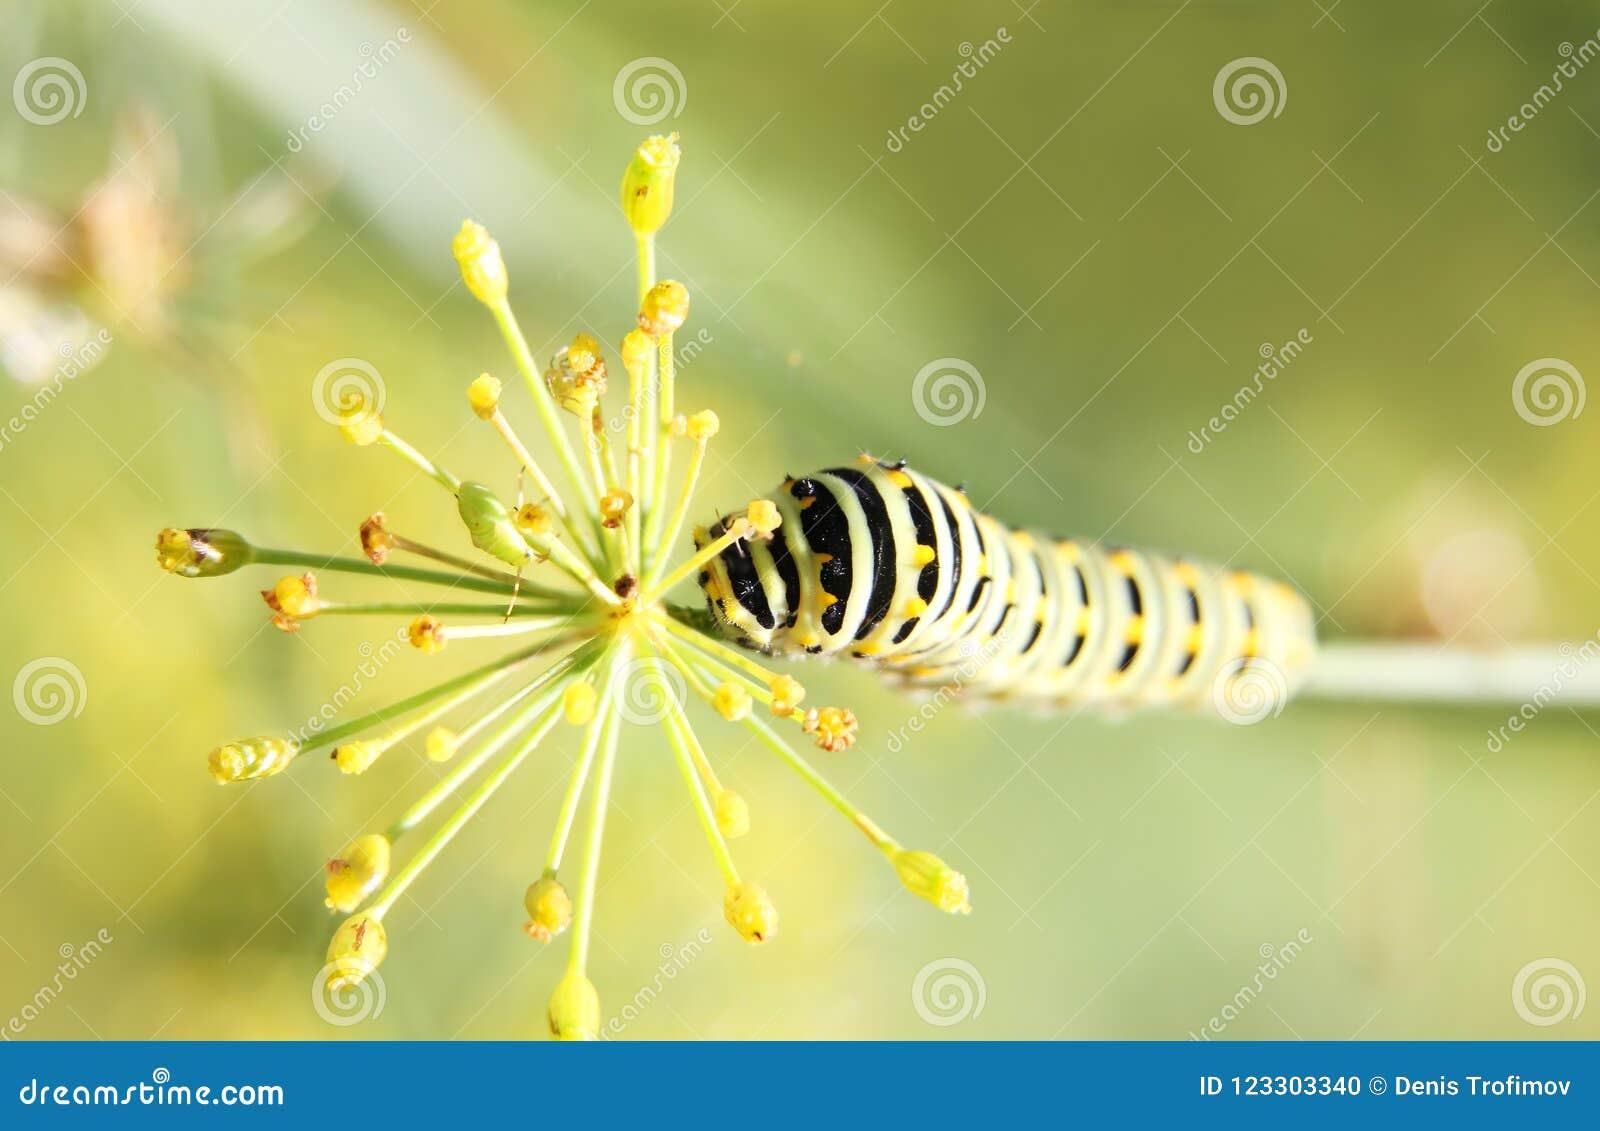 Caterpillar do swallowtail da borboleta - machaon, alimentações no aneto - erva-doce, vista superior